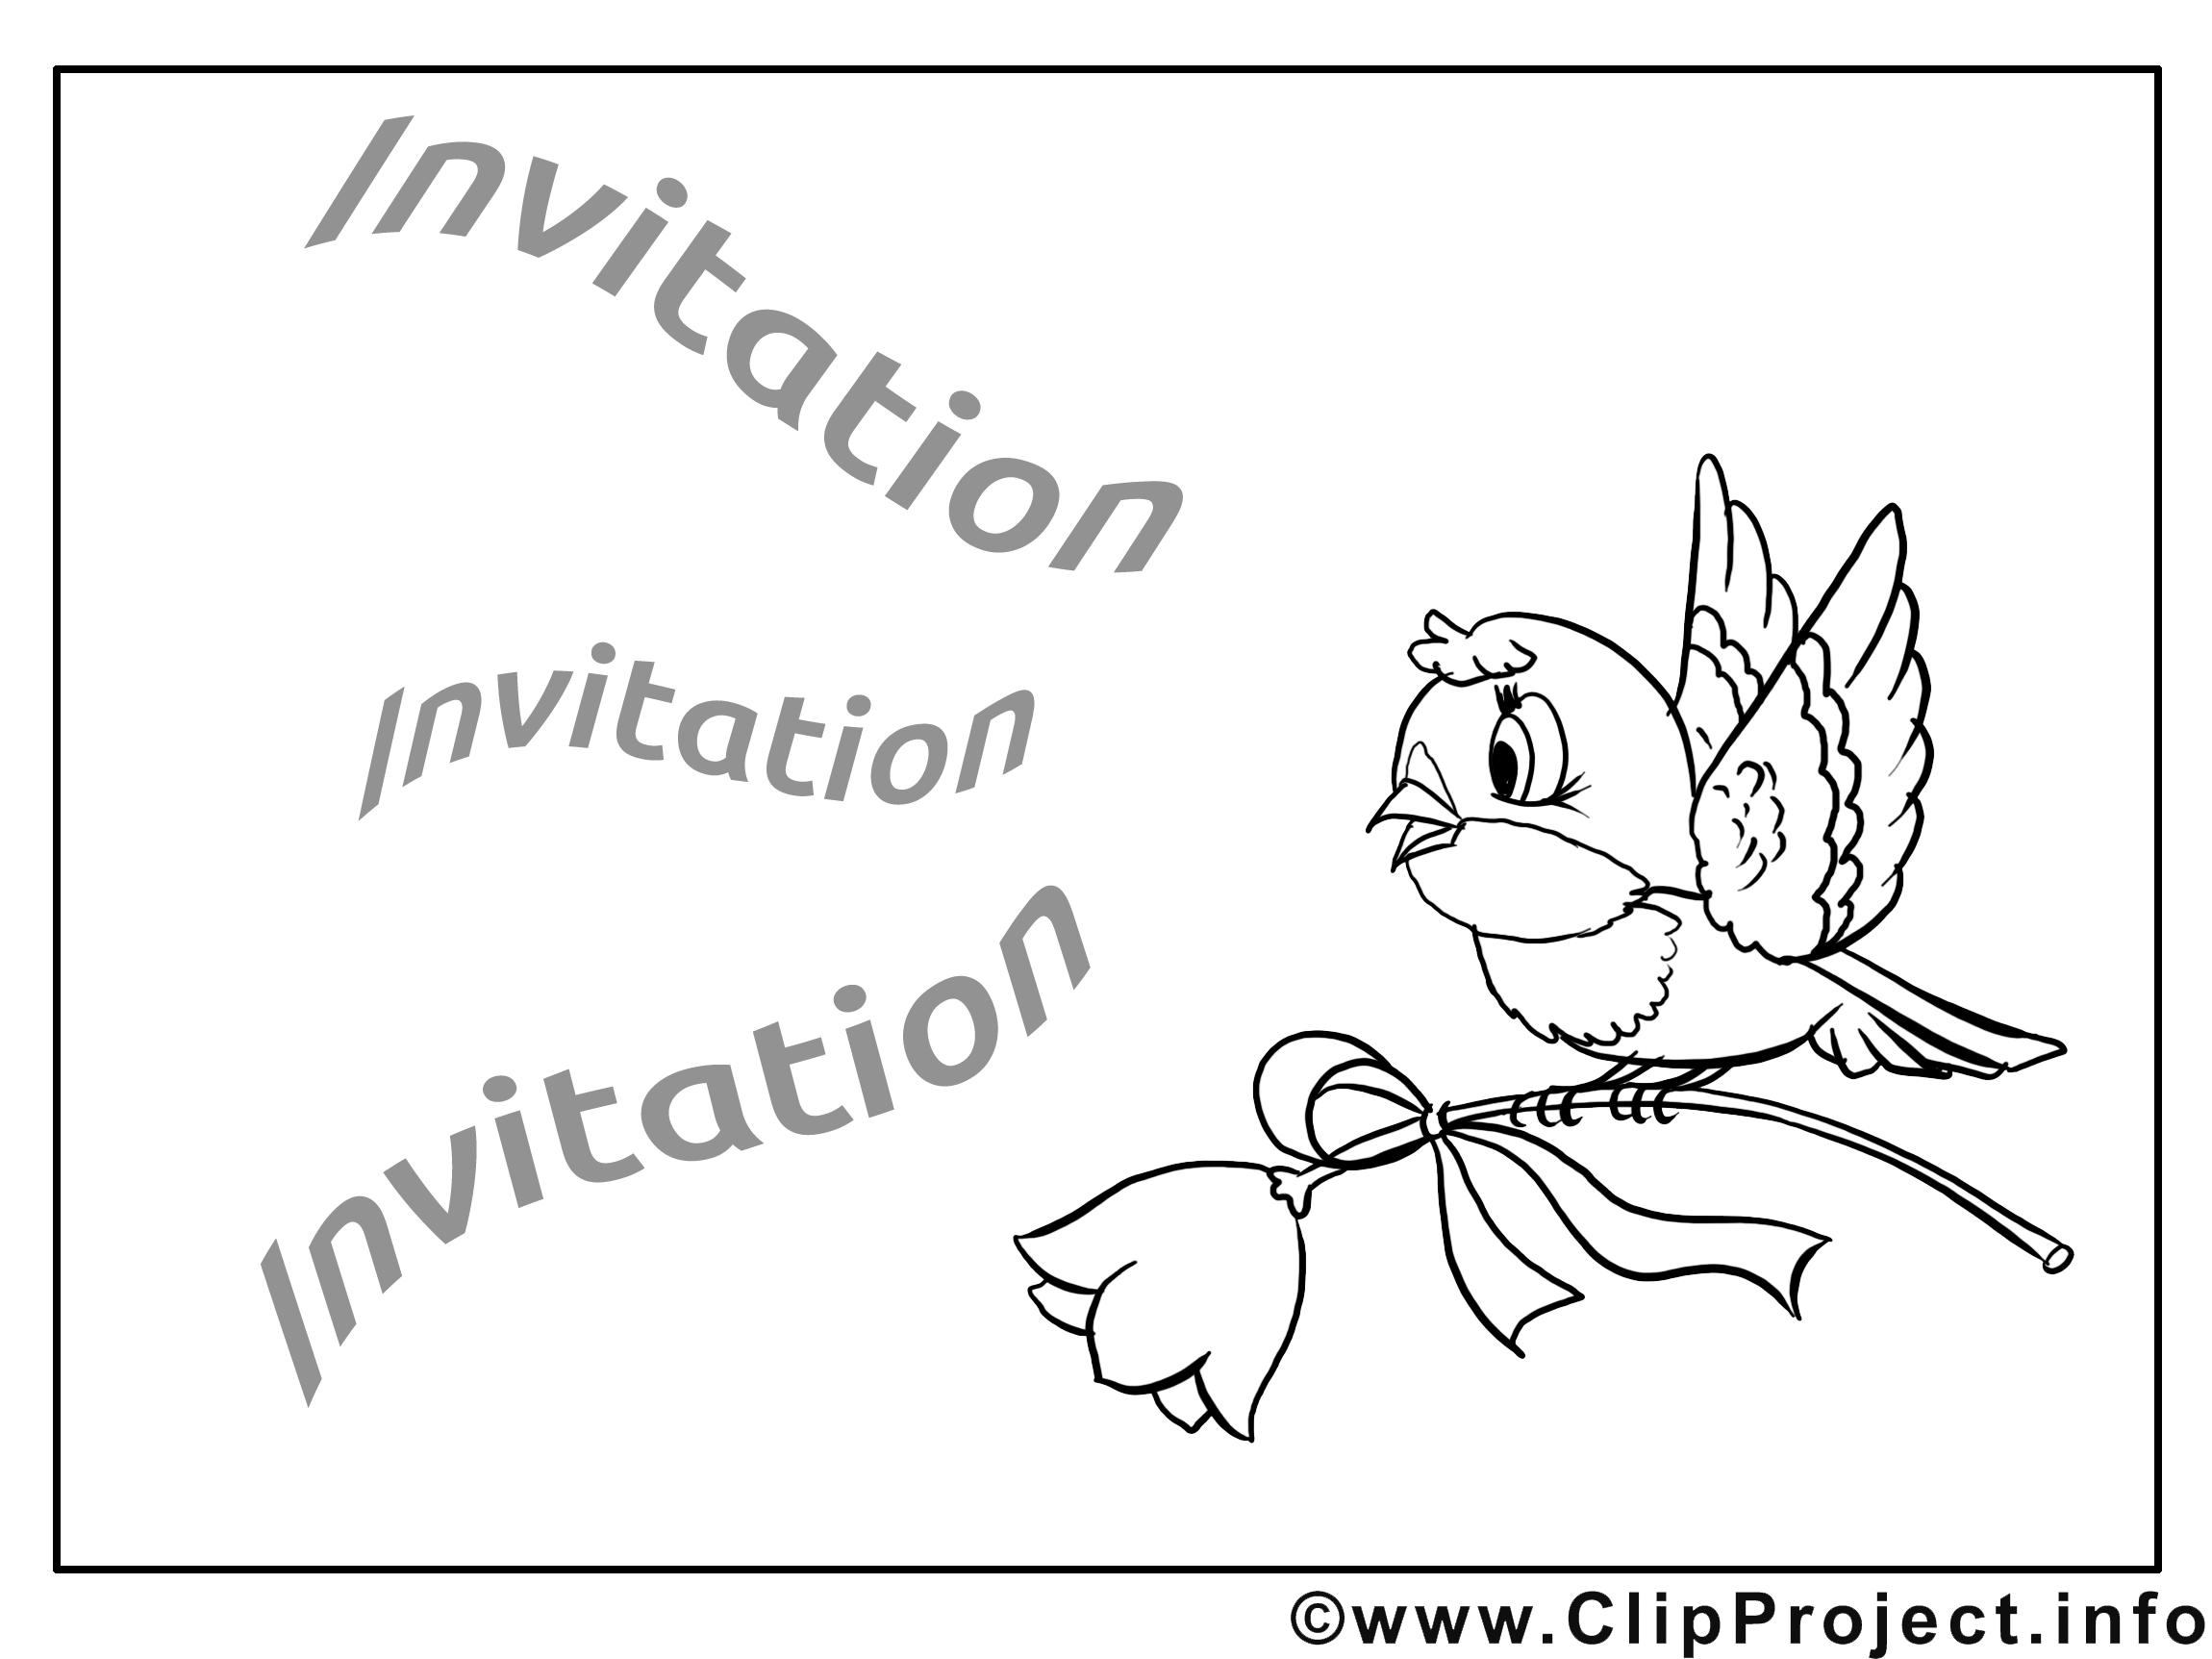 Oiseau dessin à imprimer - Invitation image